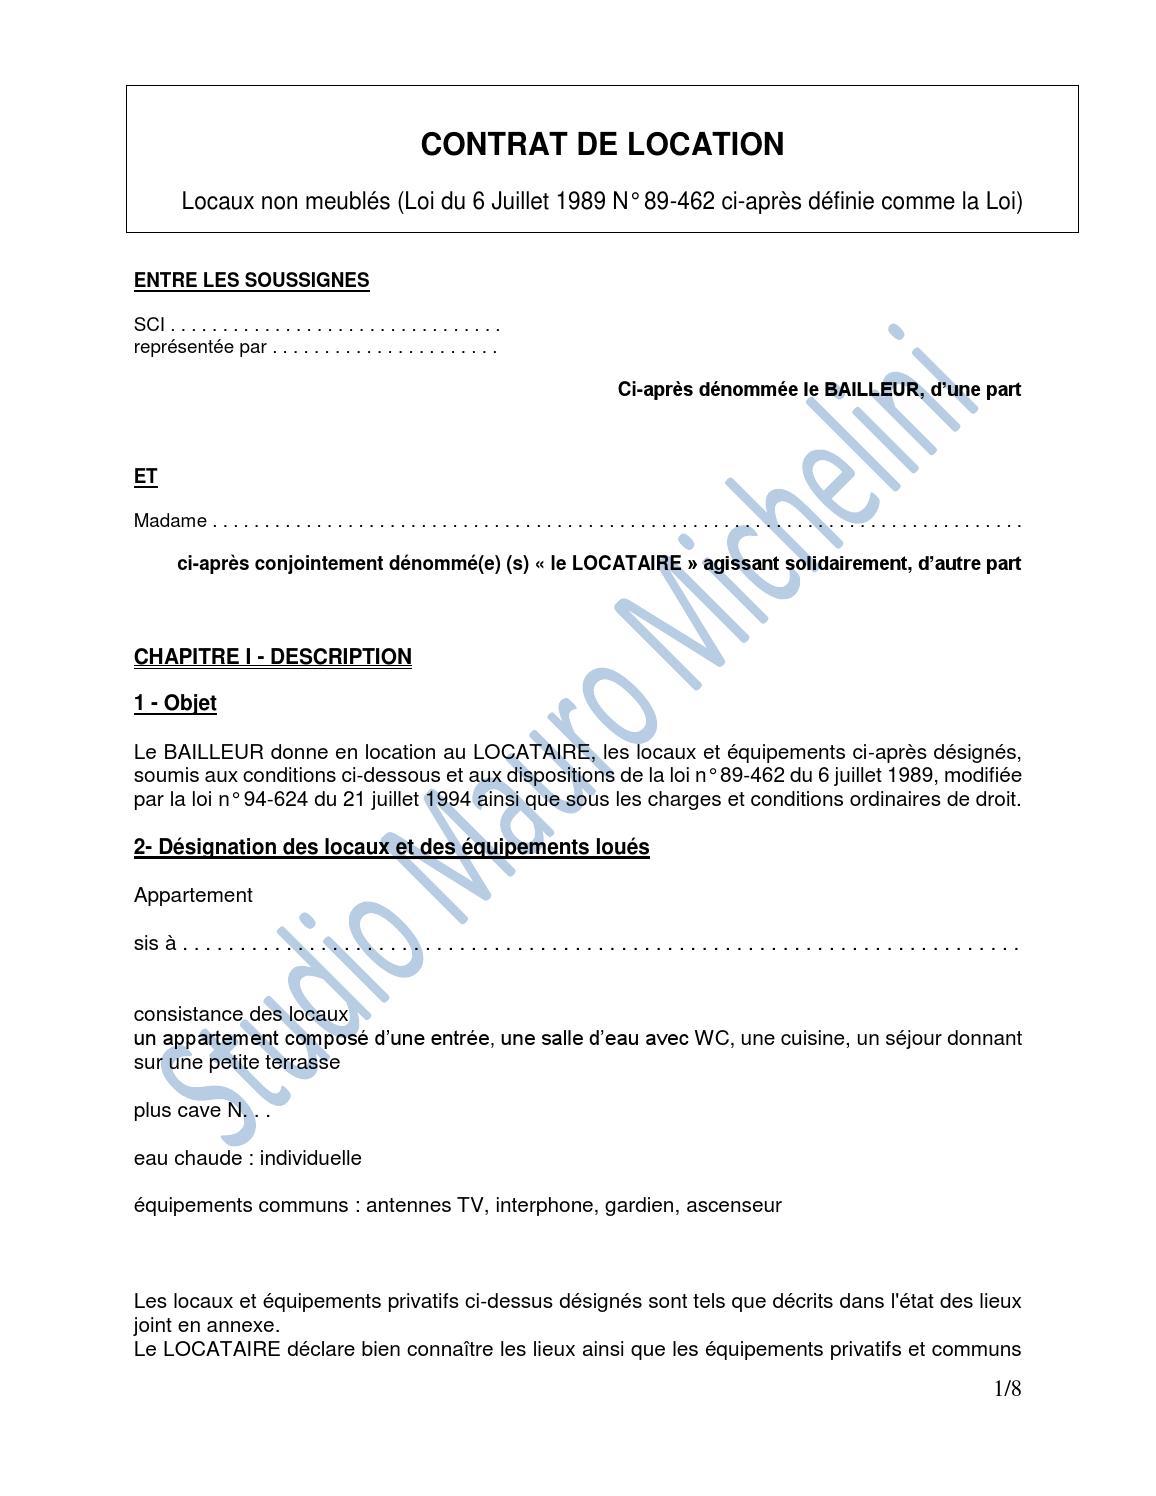 Contrat de location by cabinet michelini issuu - Contrat de location appartement non meuble ...